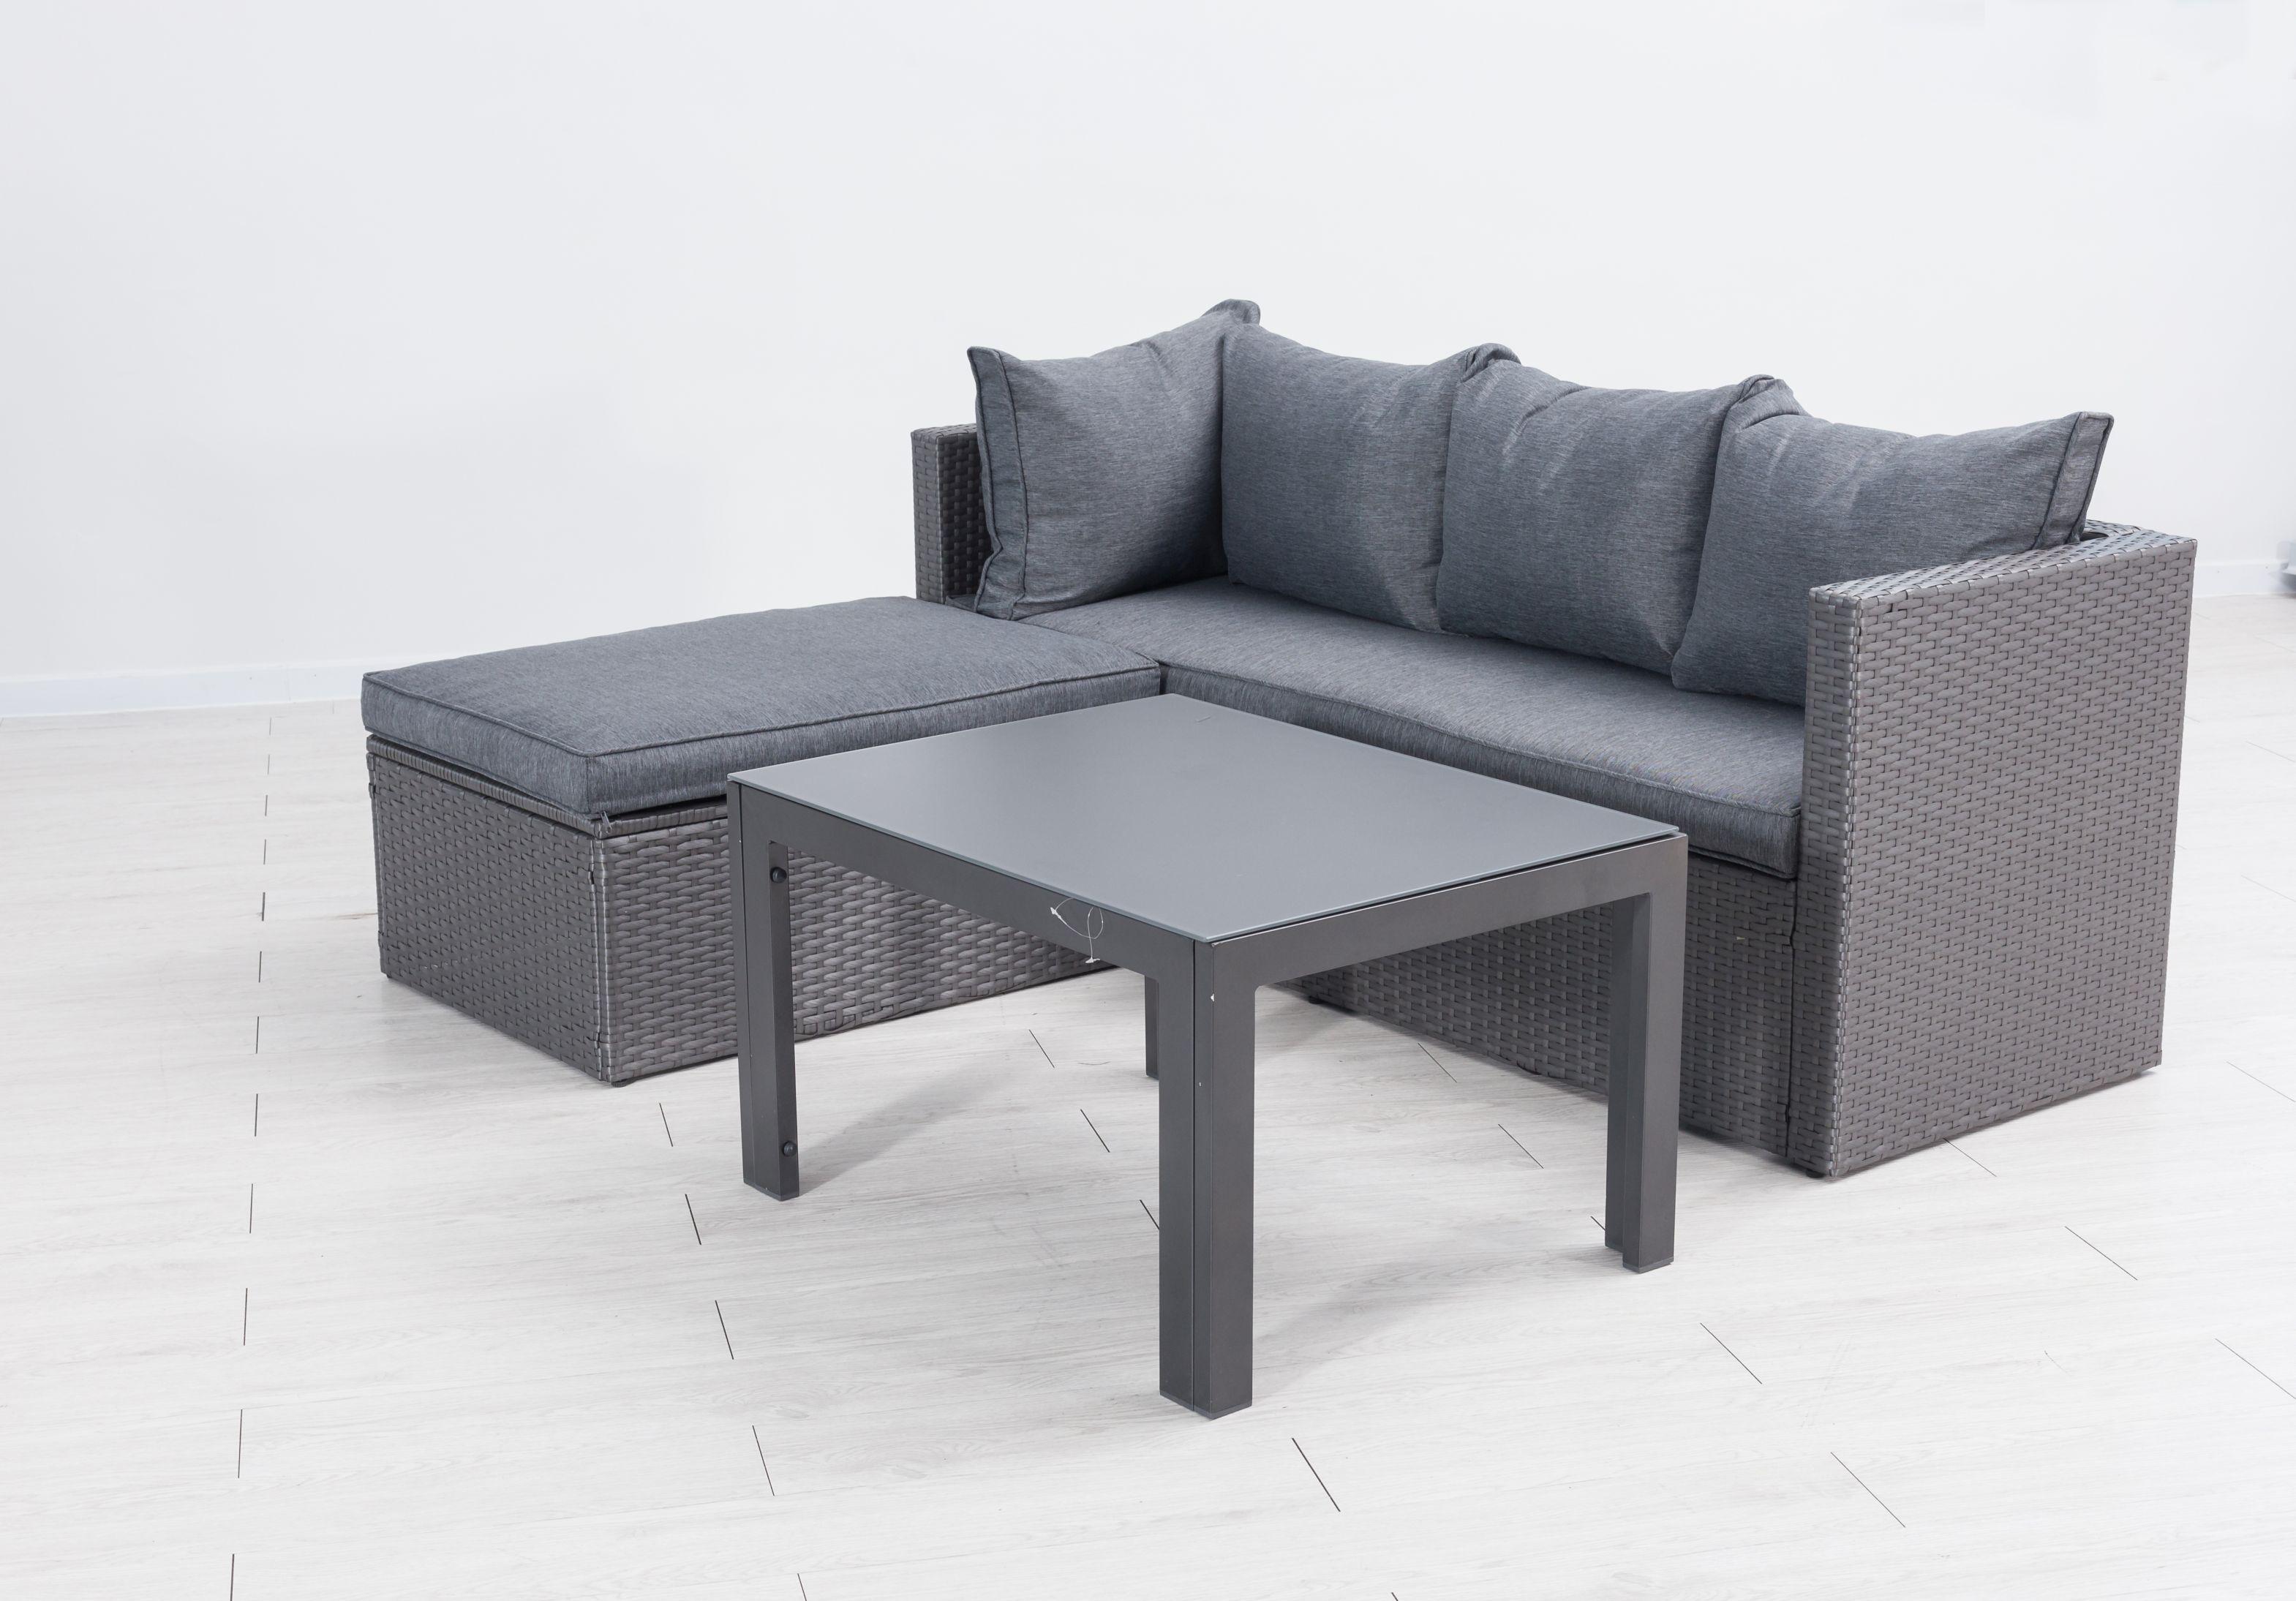 Mora Polyrattan Ecklounge Gartenmöbel Sitzgruppe Grau Lounge Möbel